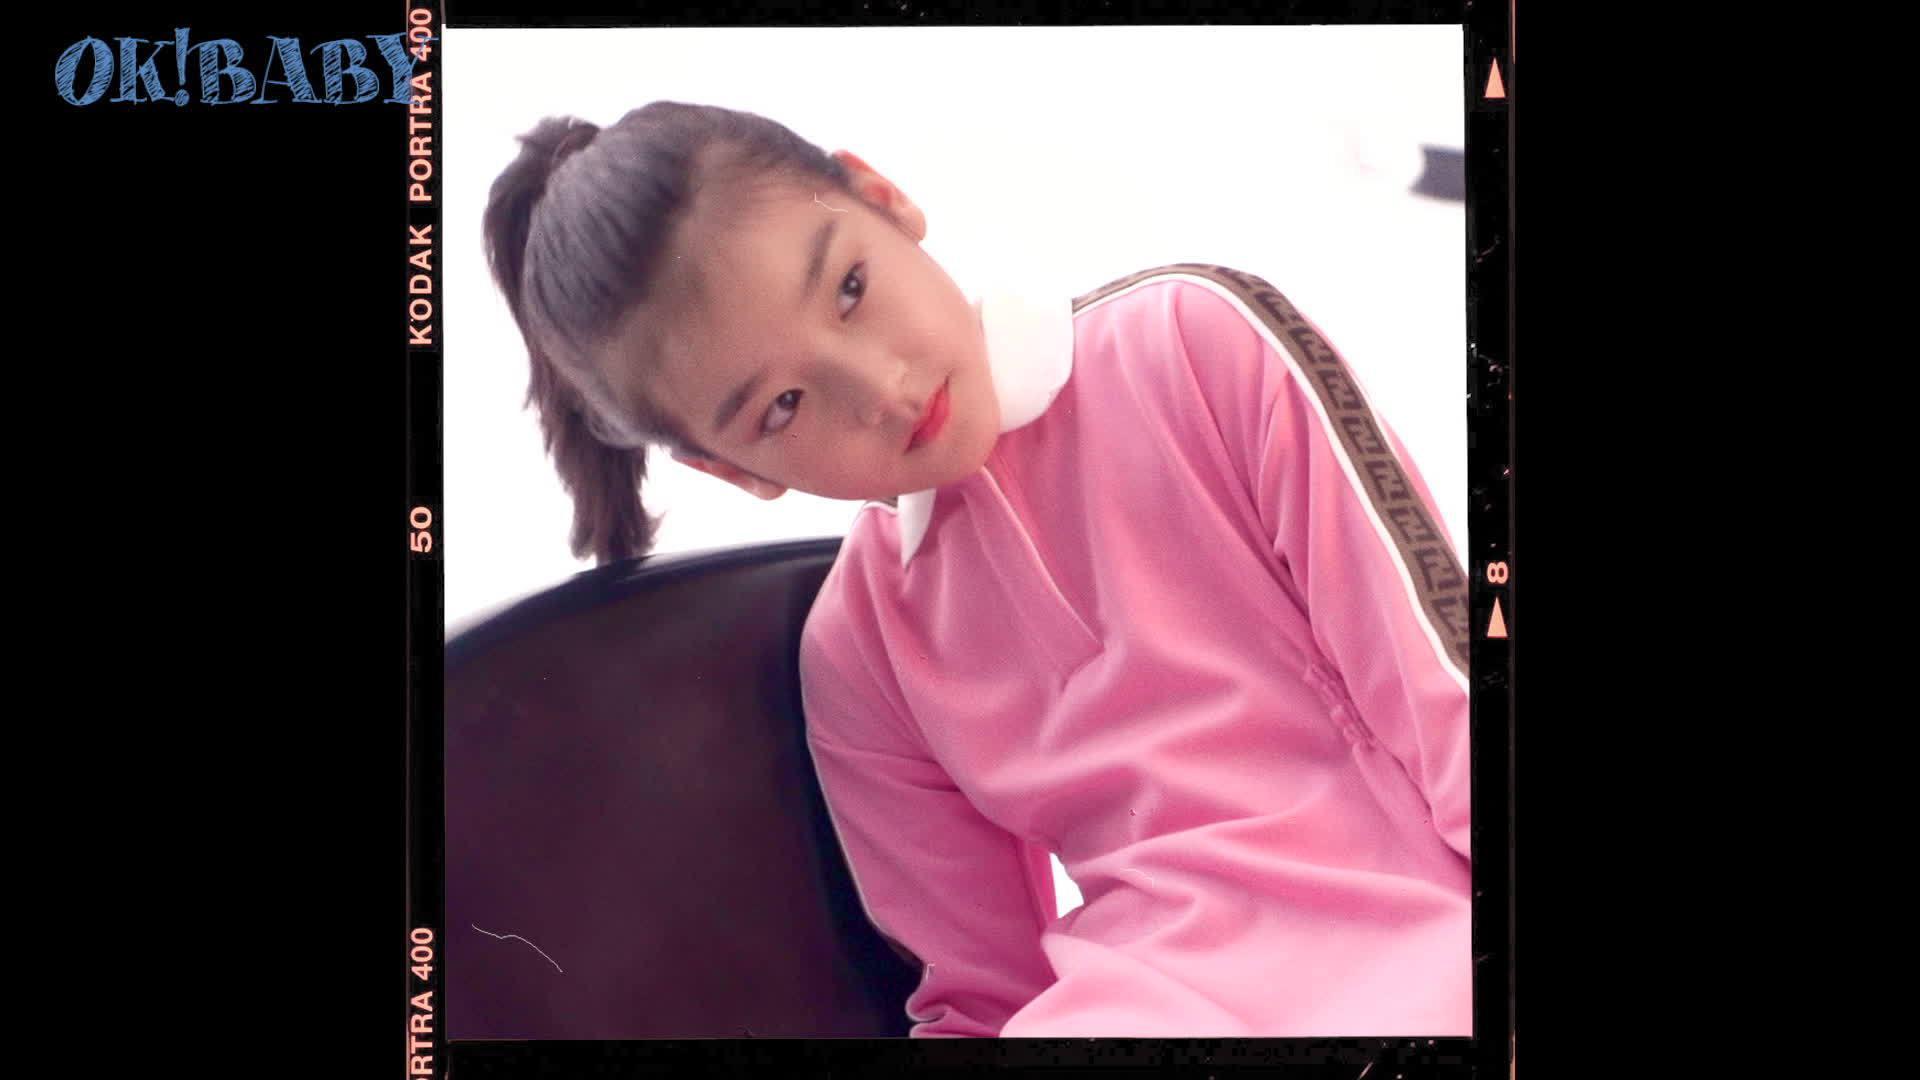 OK!Baby&@王圣迪-娃娃Angela 精彩封面拍摄花絮来啦!